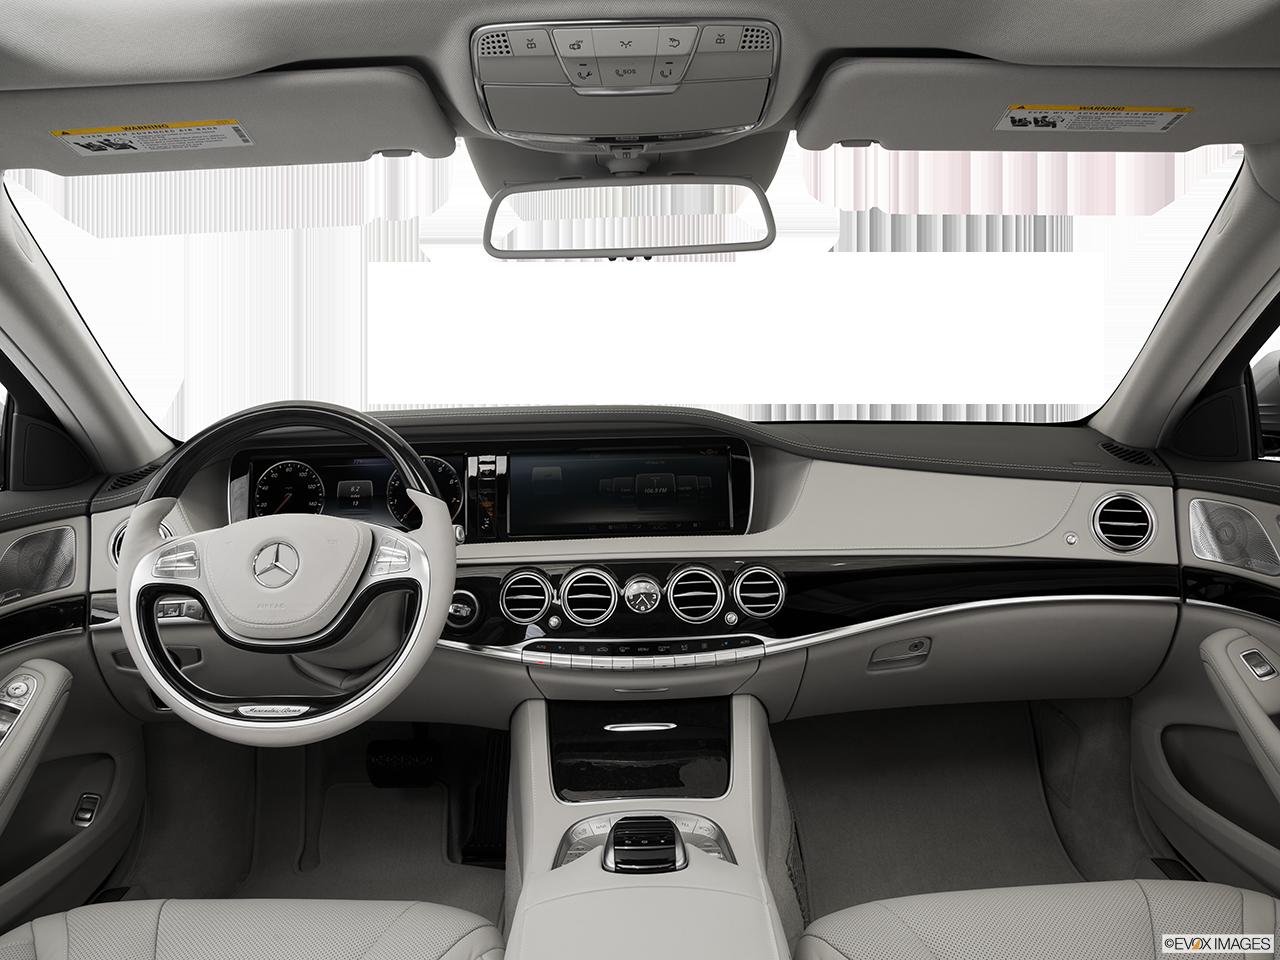 2016 Mercedes Benz S550 Worcester Wagner Mercedes Benz Of Shrewsbury